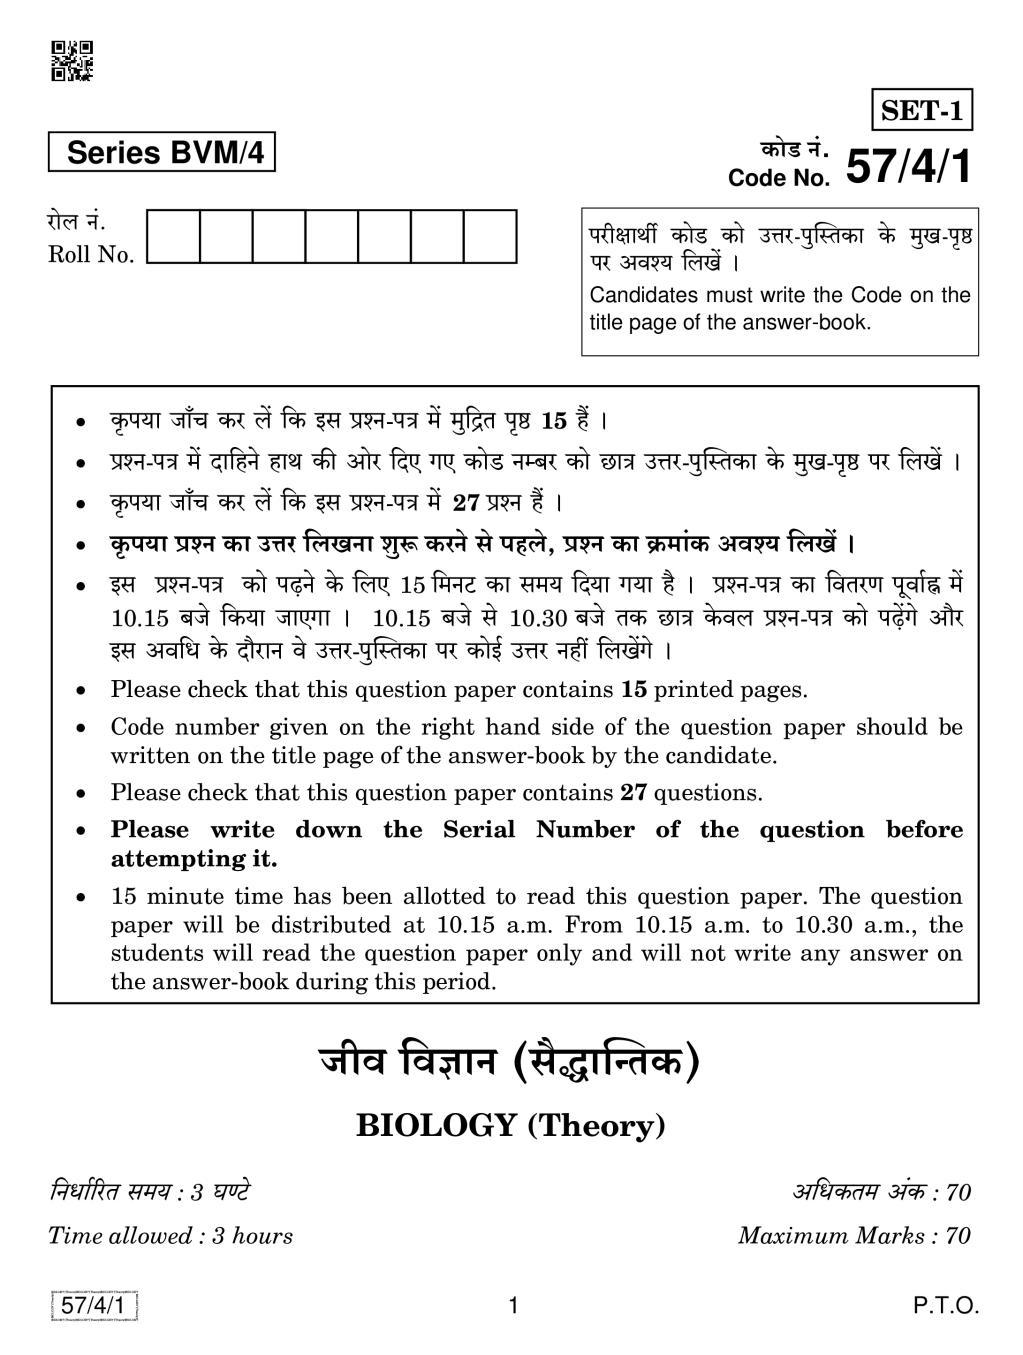 CBSE Class 12 Biology Question Paper 2019 Set 4 - Page 1